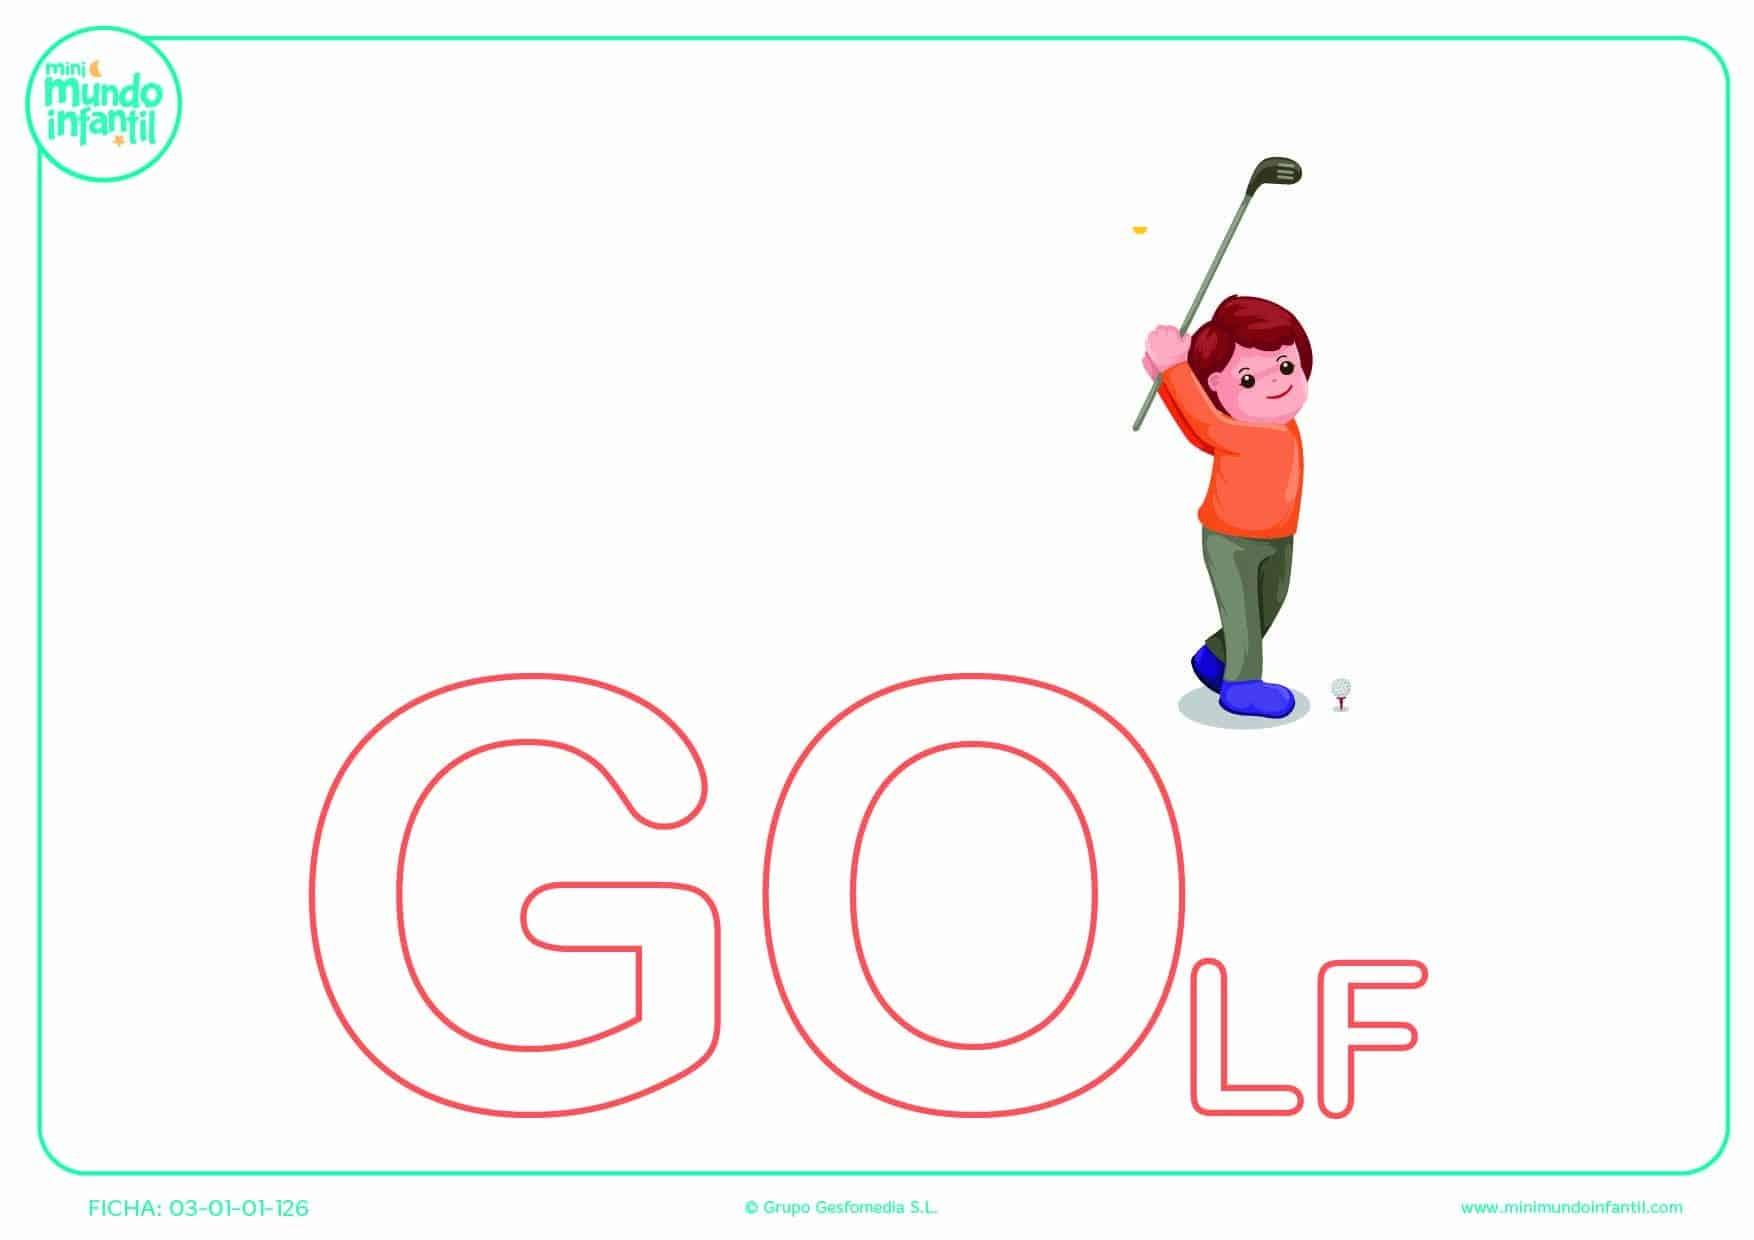 Sílaba GO mayúscula de golf para completar